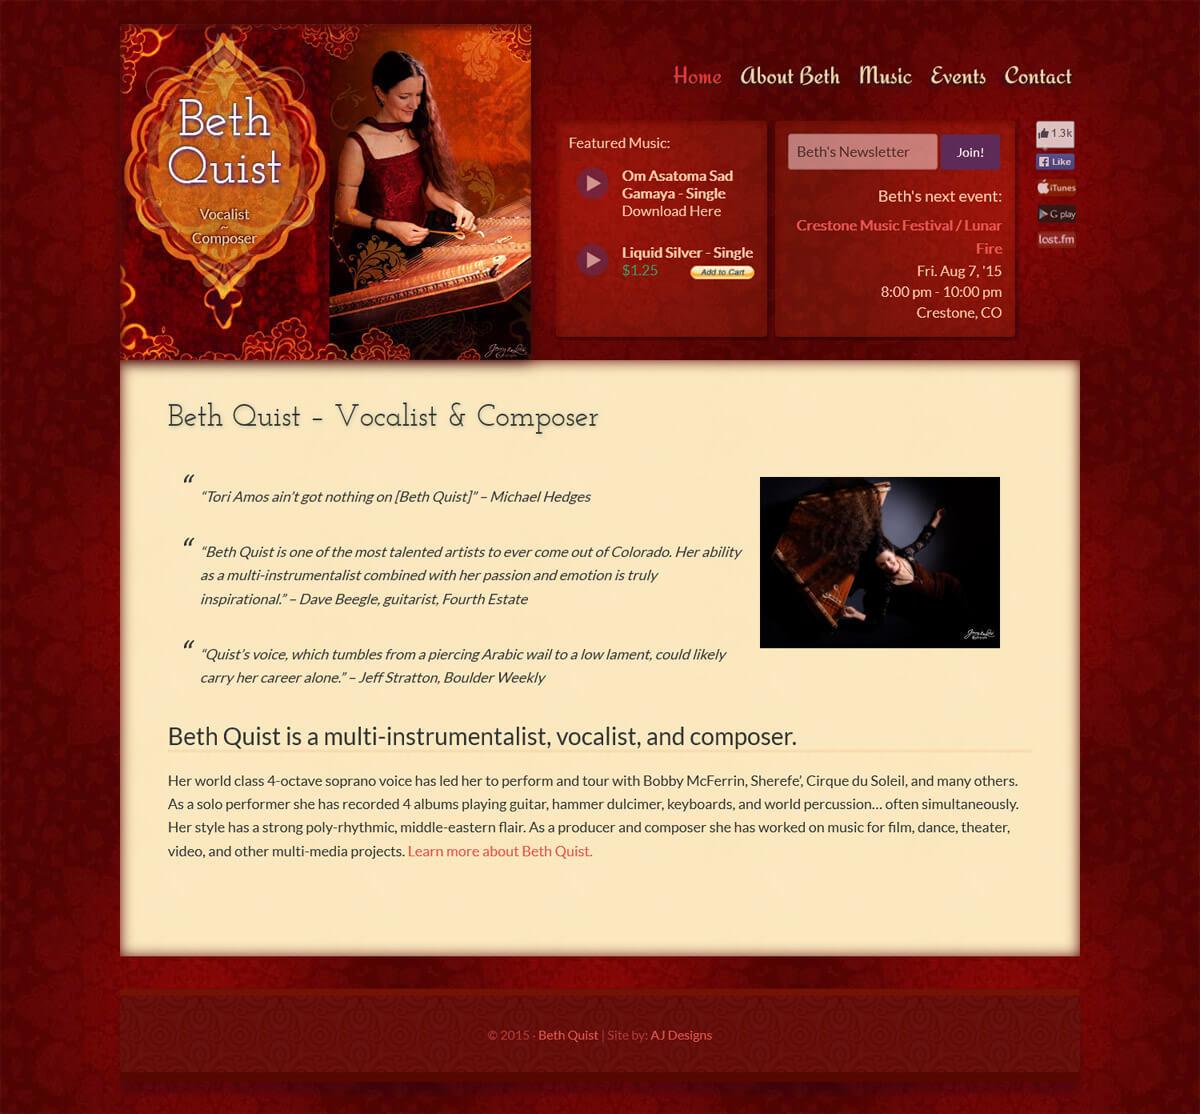 BethQuist.com